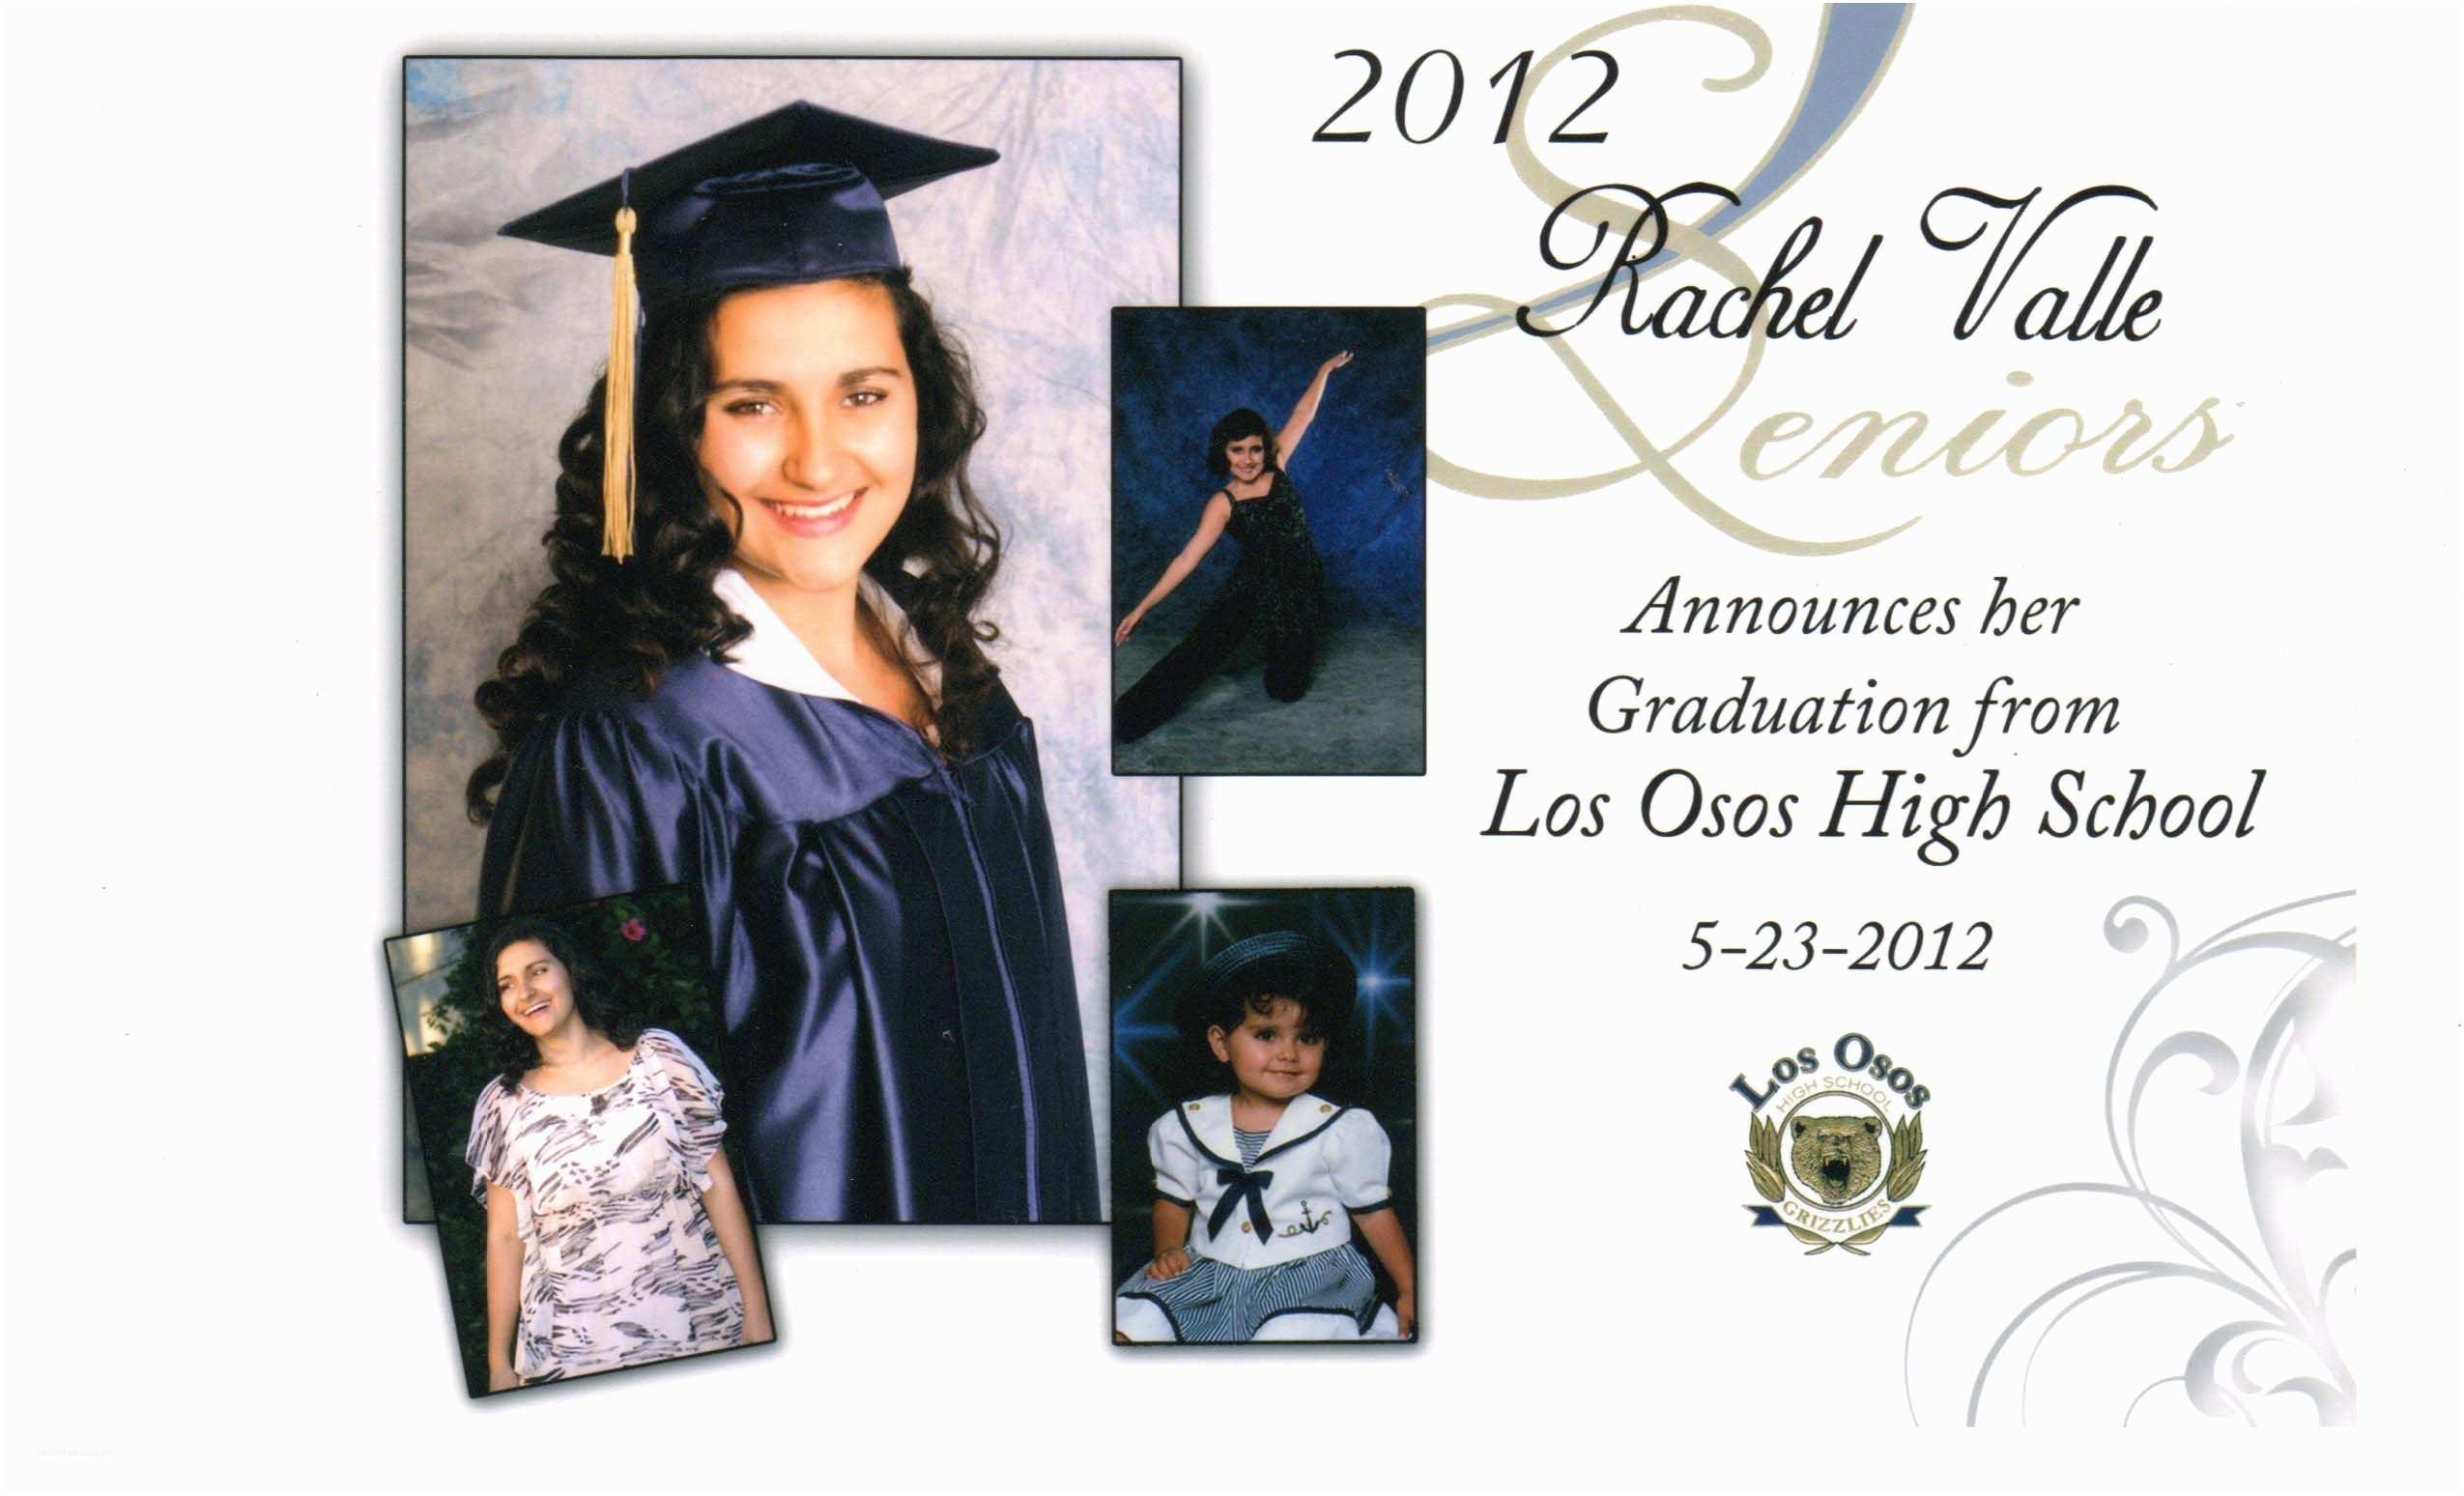 High School Graduation Invitations Templates for Traditional High School Graduation